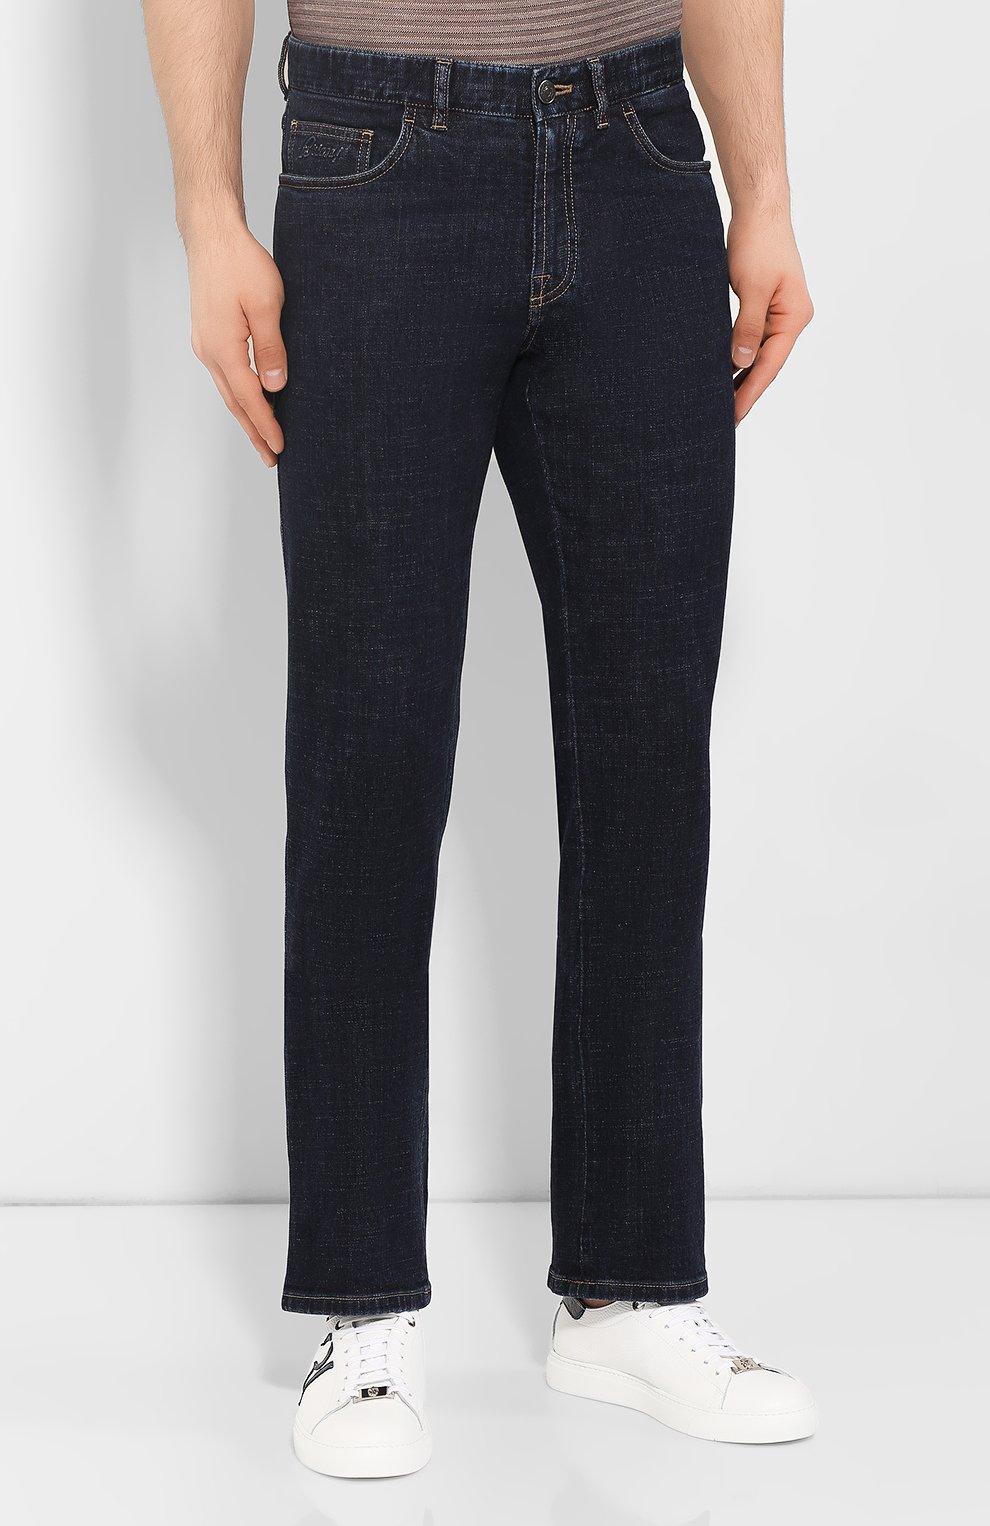 Мужские джинсы BRIONI темно-синего цвета, арт. SPNJ0L/P9D37/STELVI0 | Фото 3